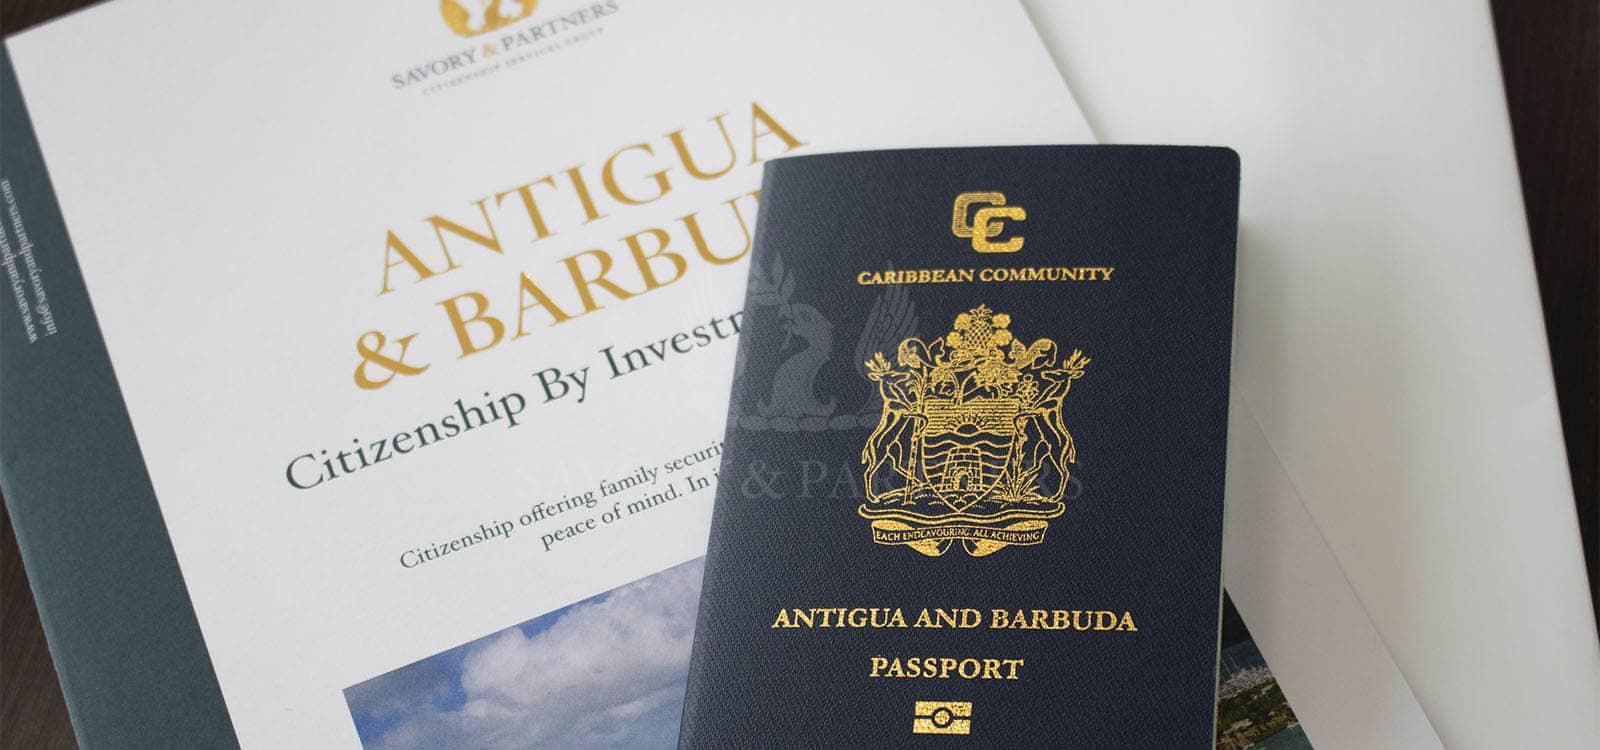 Antigua and Barbuda citizenship and passport.